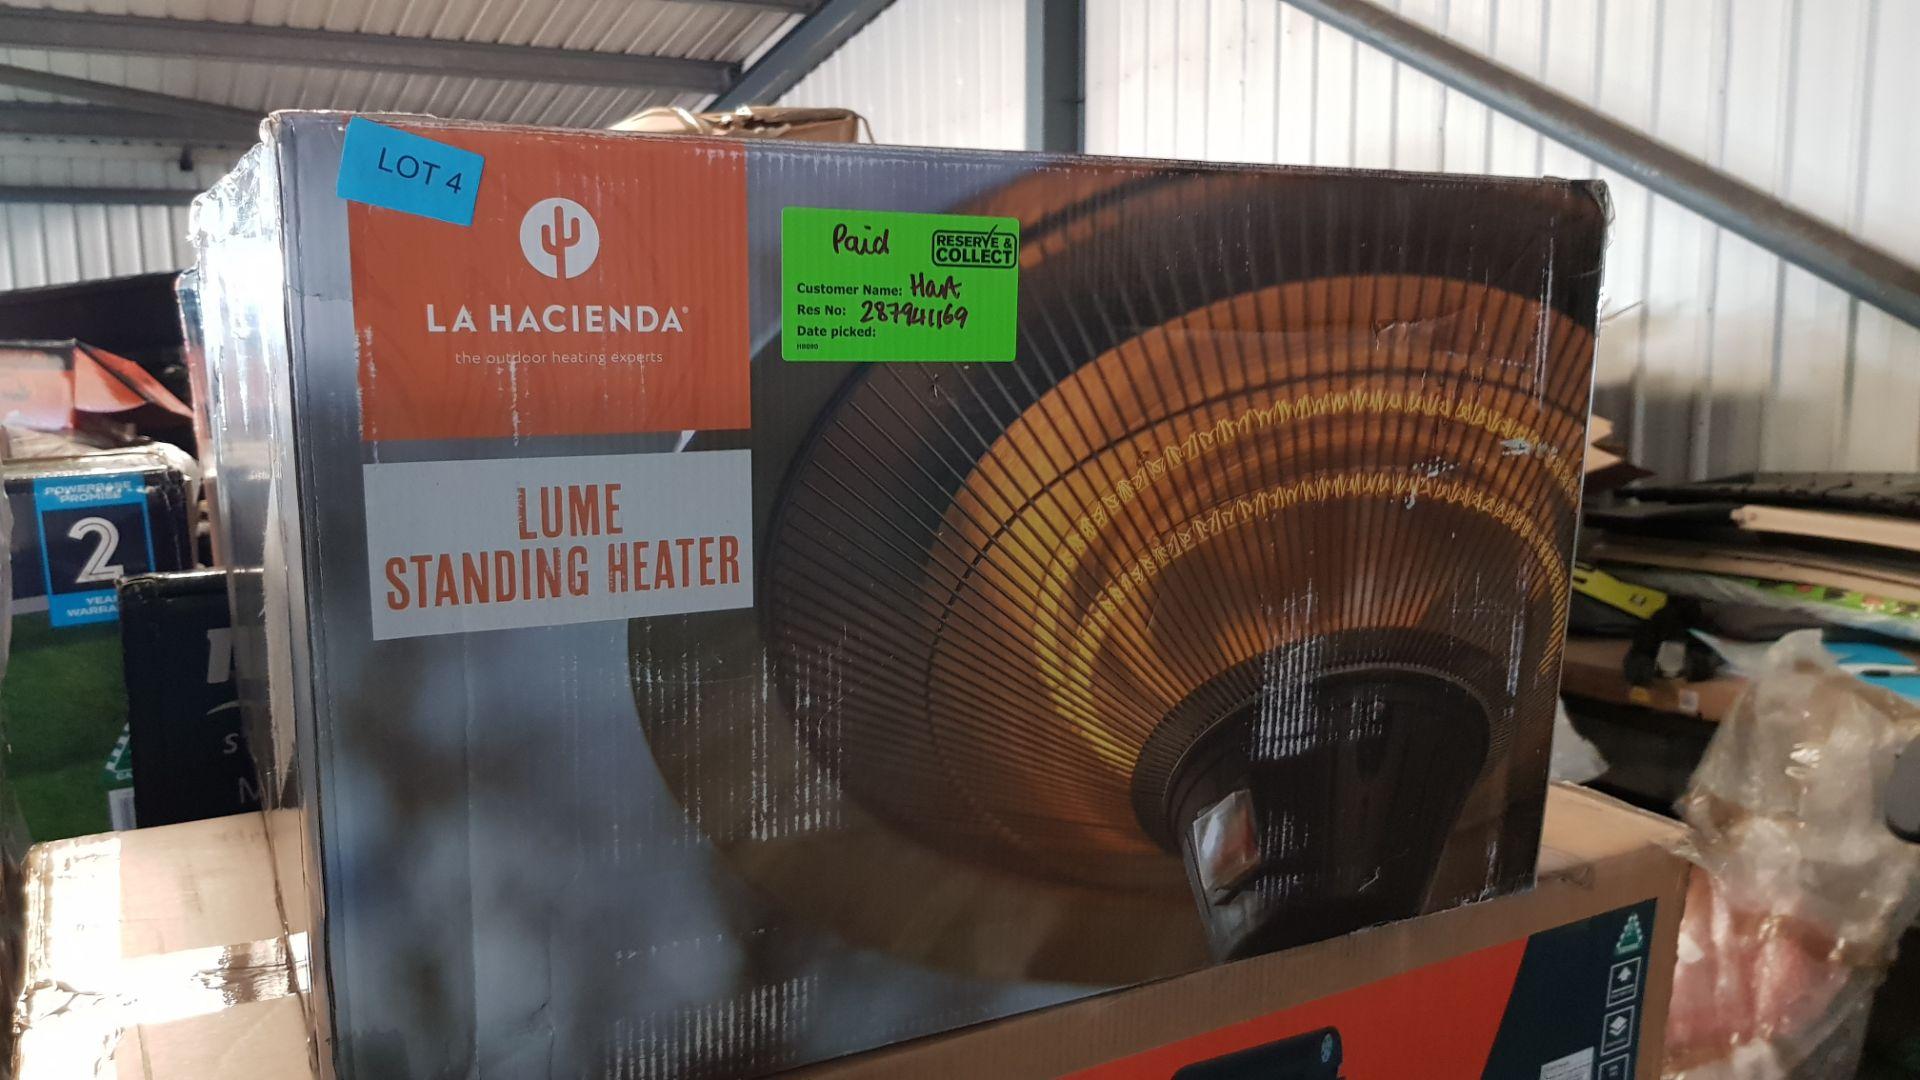 (P8) 1x La Hacienda Lume Standing Heater RRP £99.99. 3 Heater Settings: 900W, 1200W & 2100W (H205 - Image 3 of 3